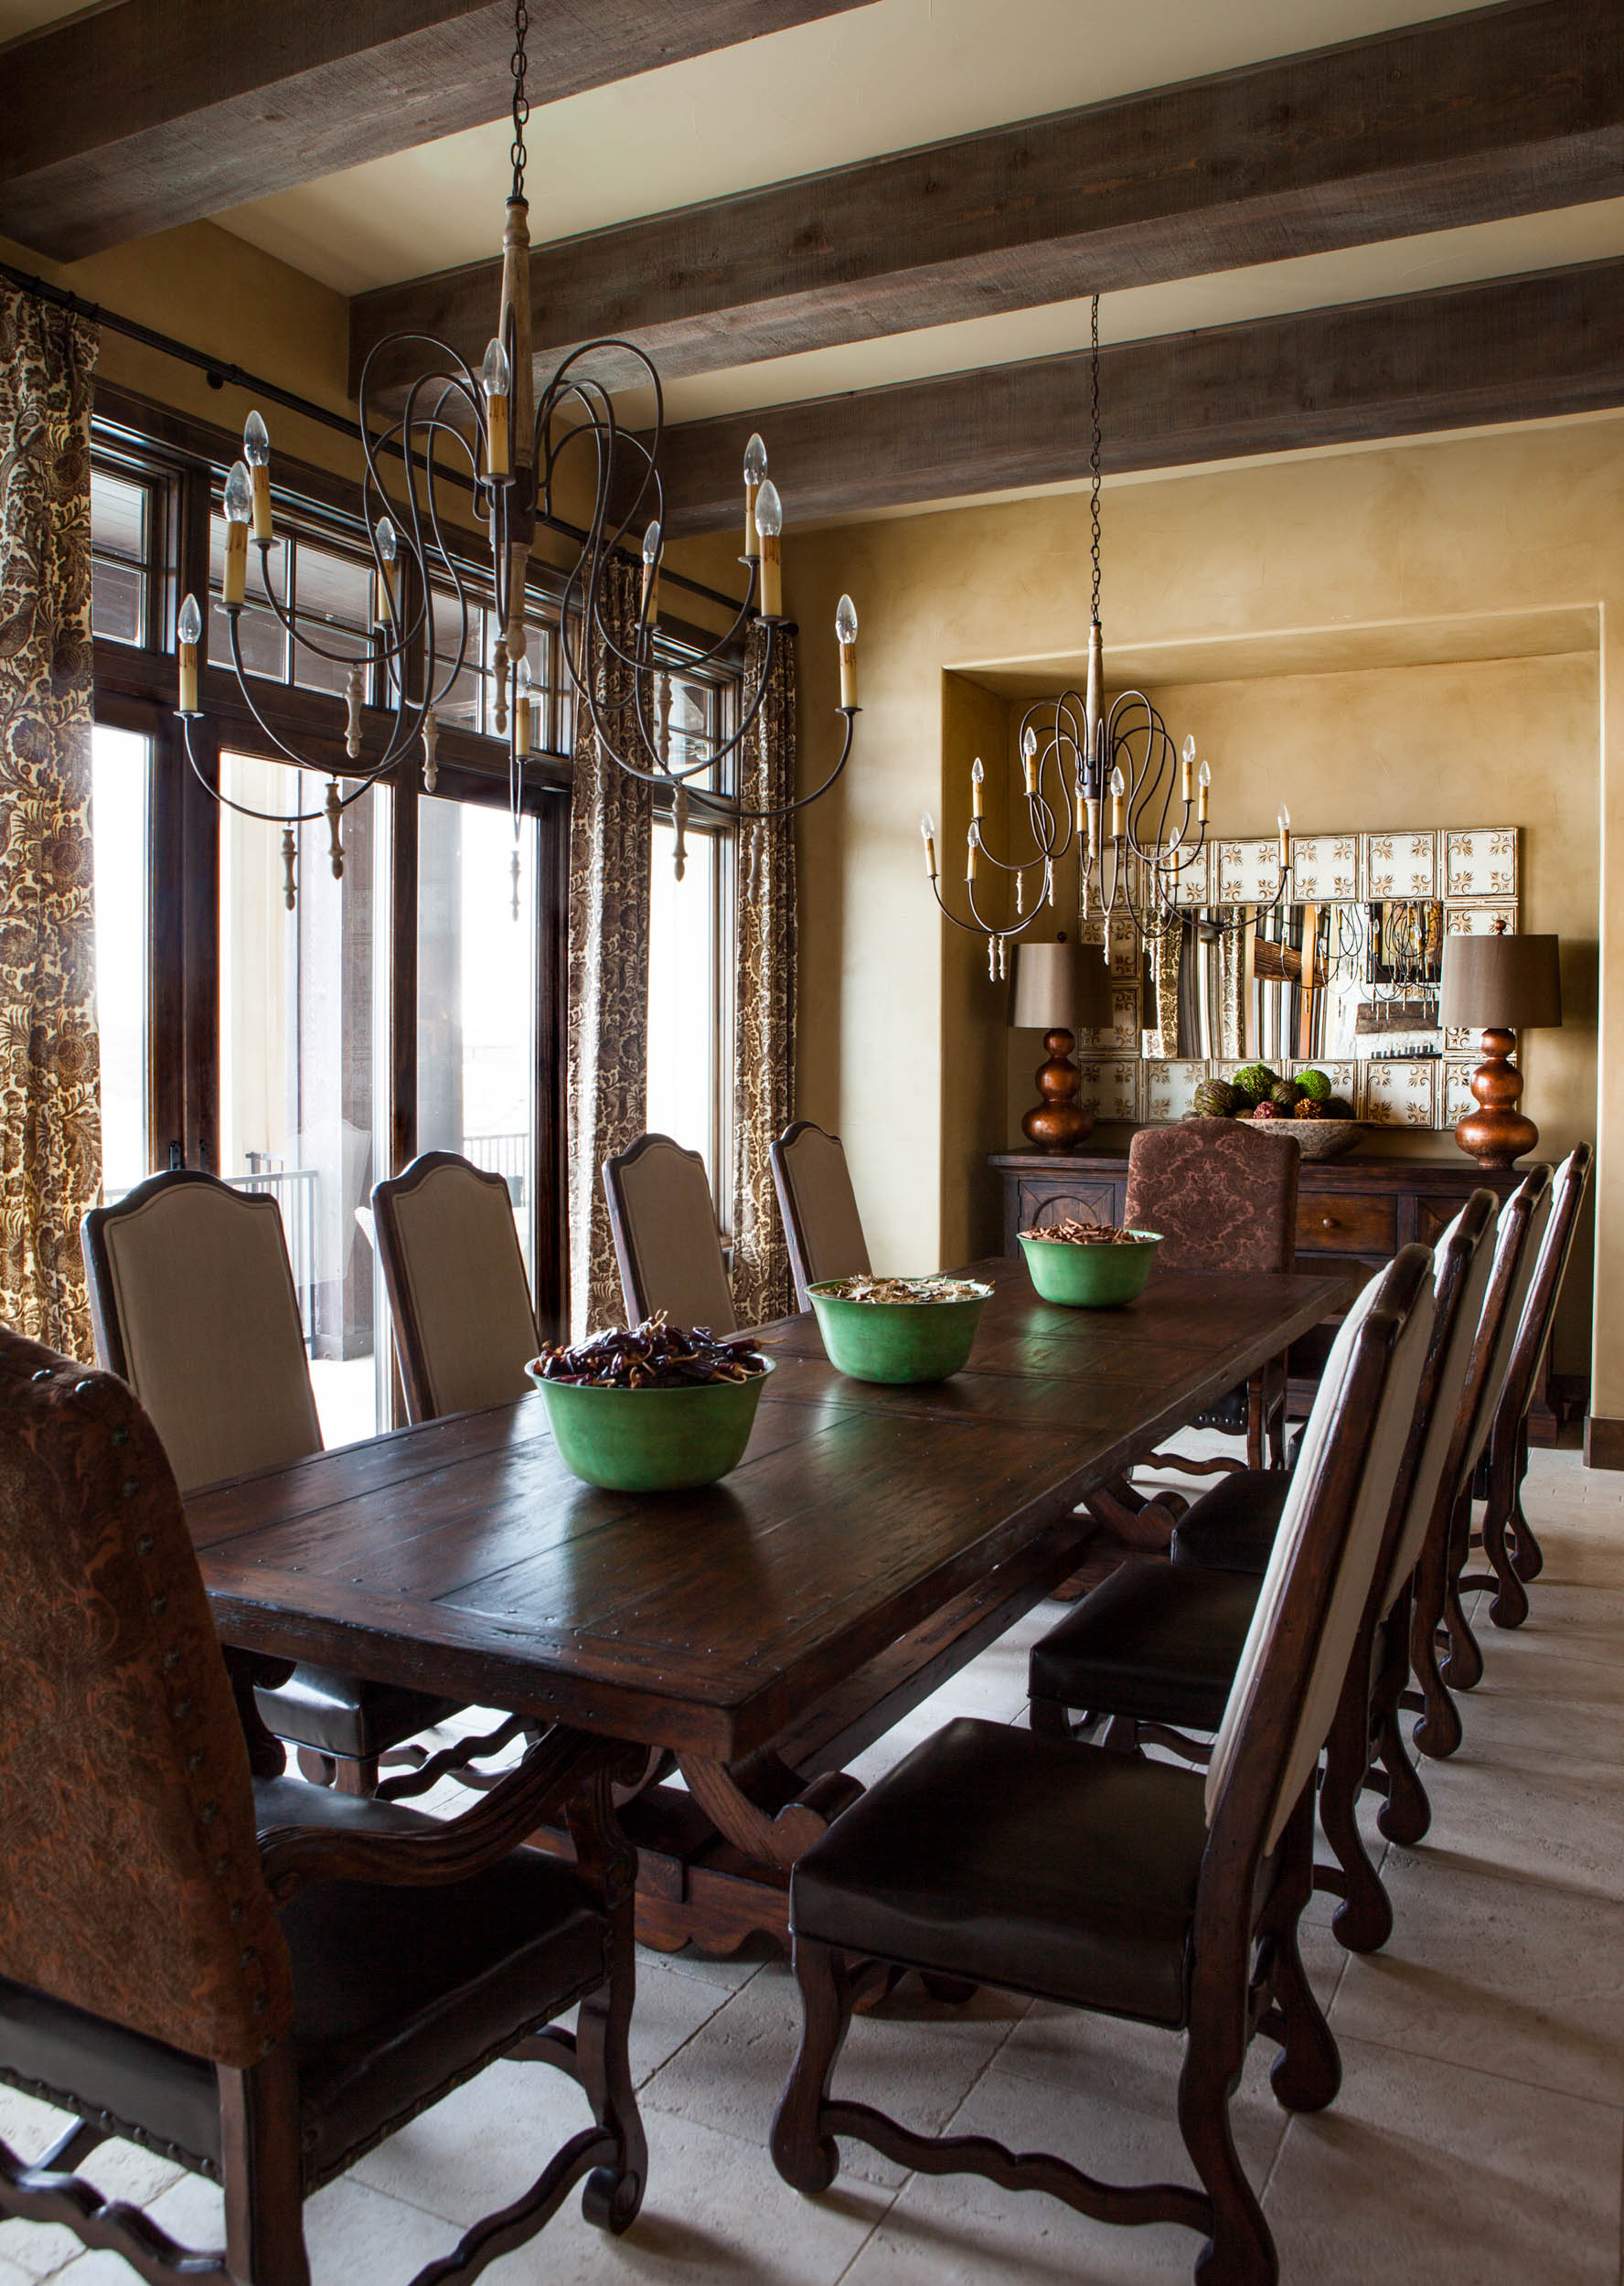 austin-house-dining-room-interior-design.jpg